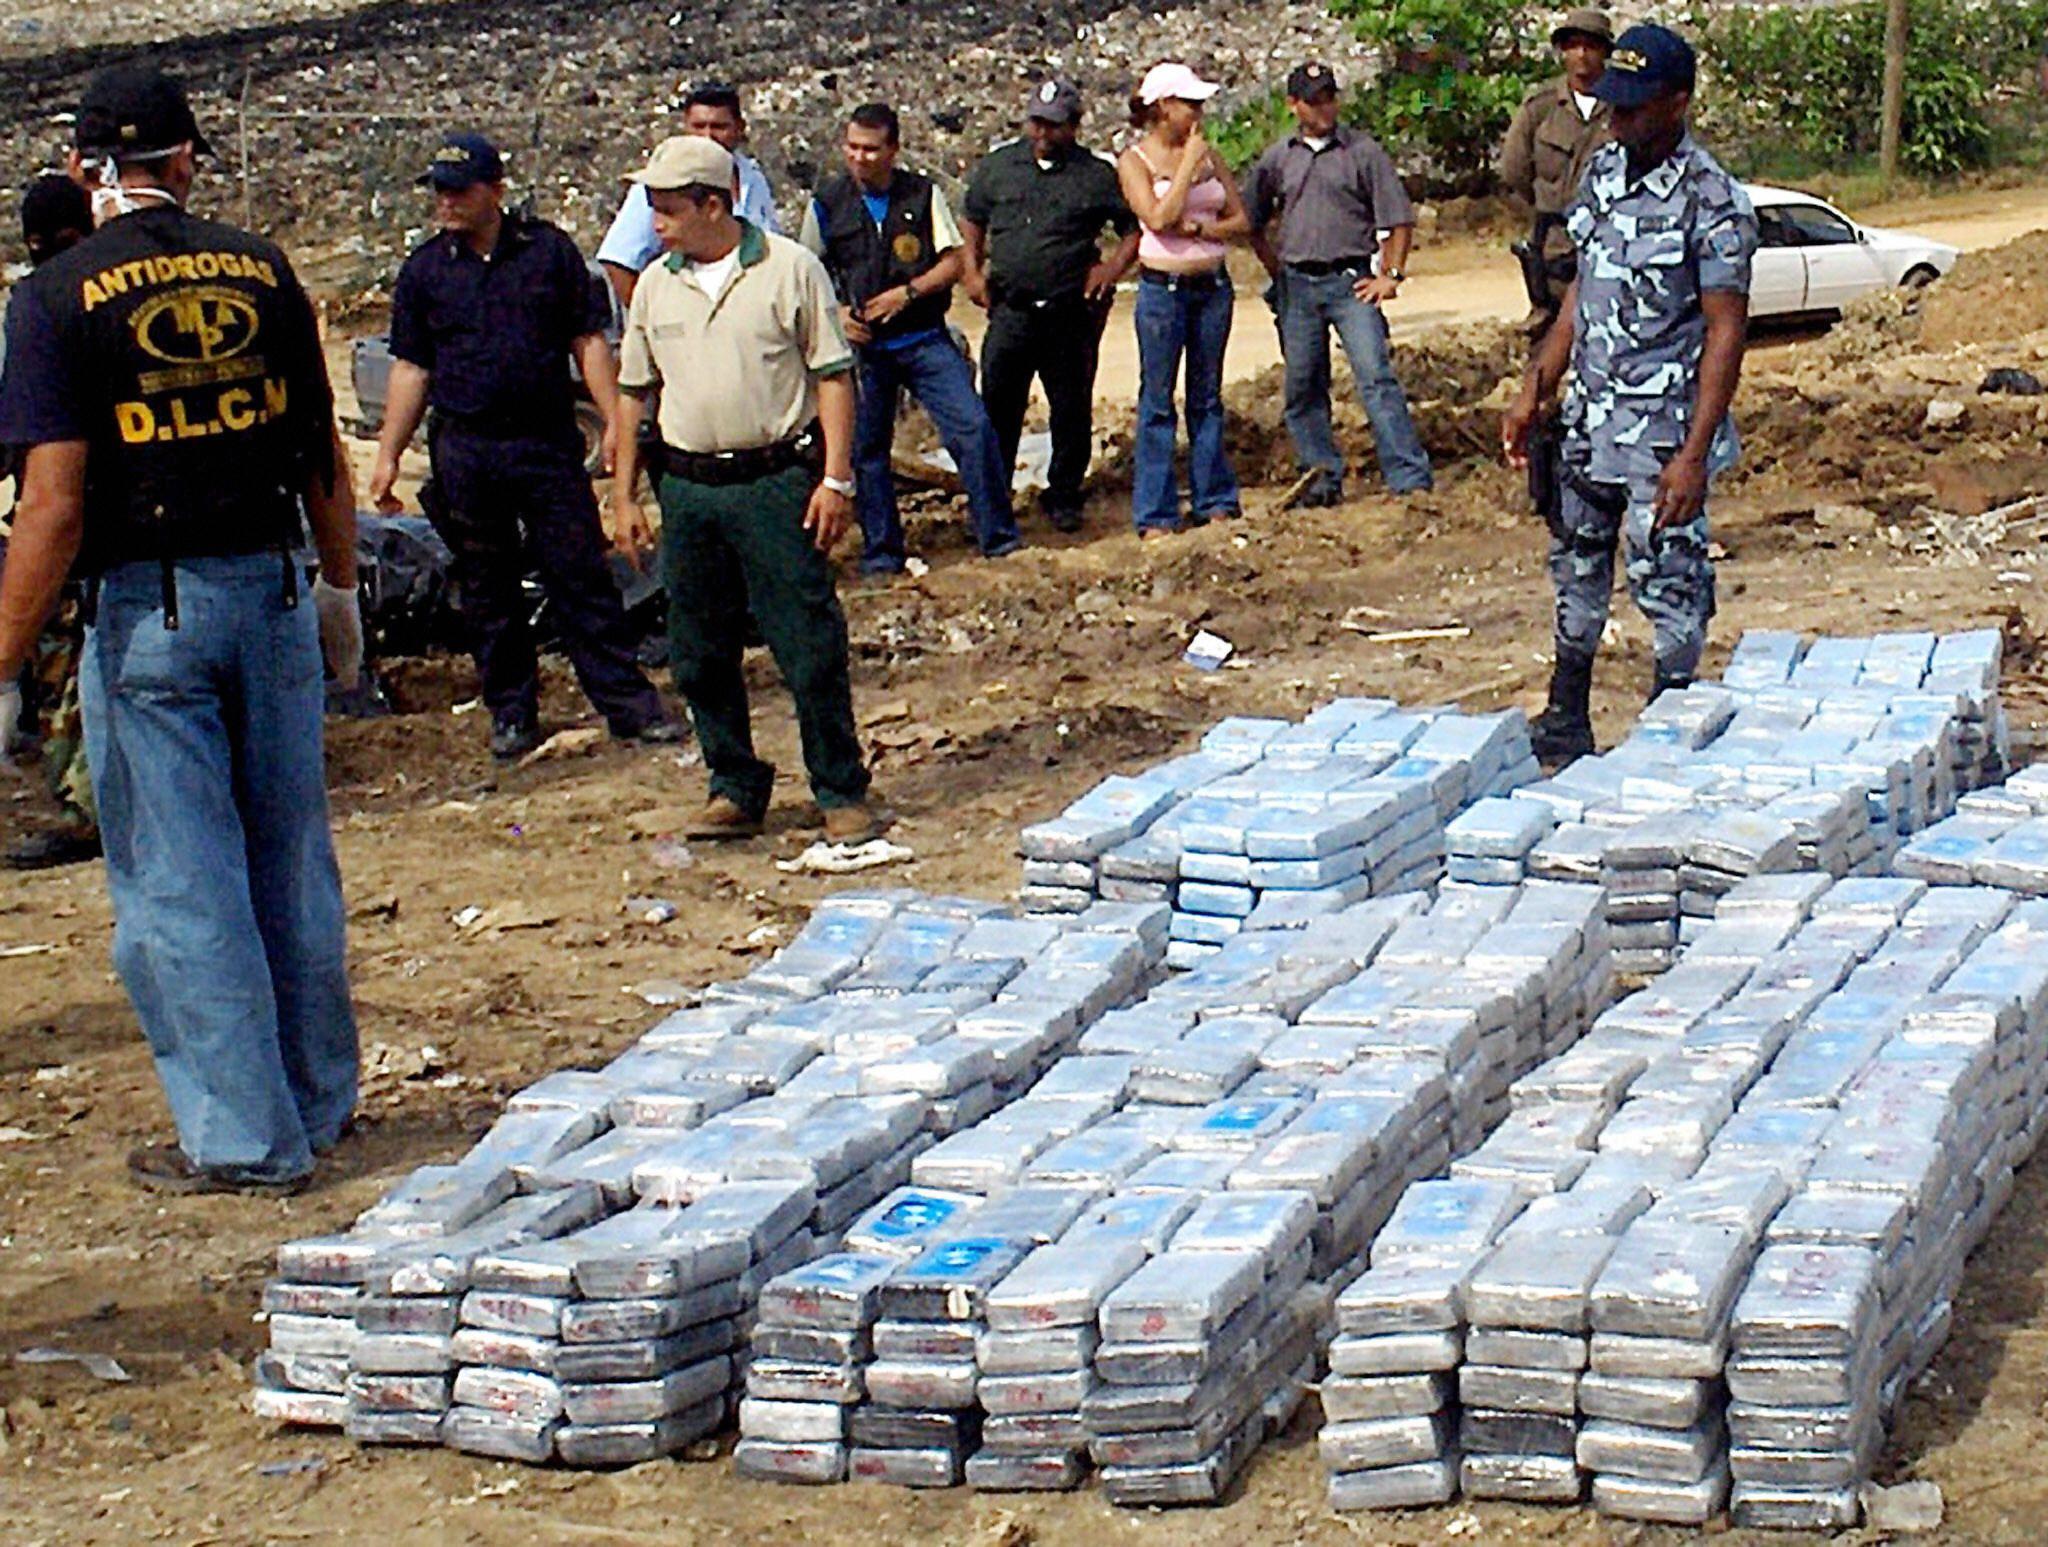 drug cartel - Google Search | Art Activisim | Pinterest ...